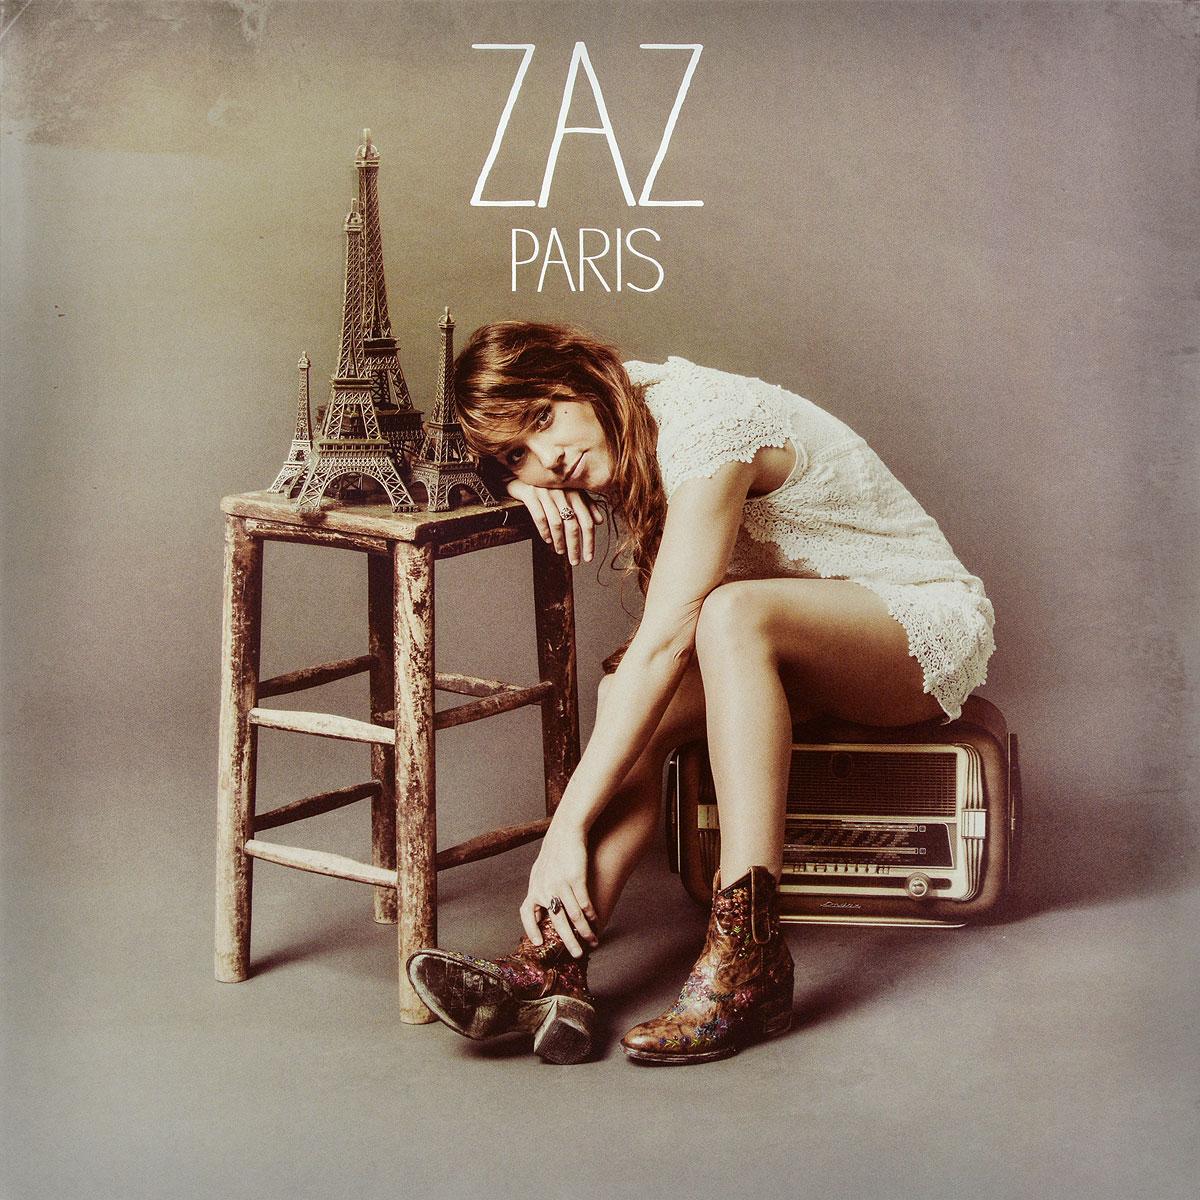 Zaz Zaz. Paris (2 LP) cd zaz paris